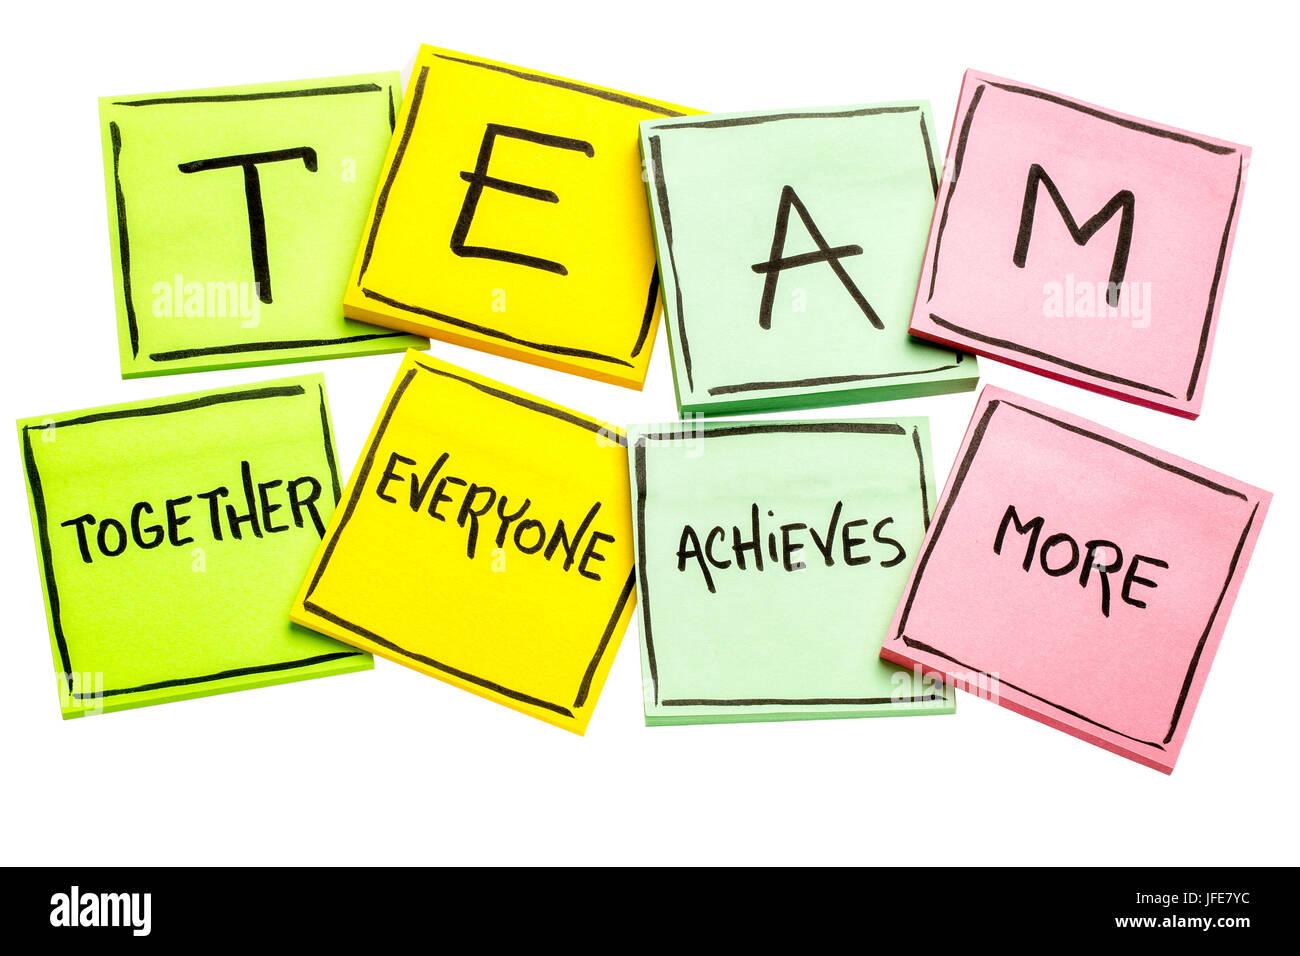 team acronym  together everyone achieves more   teamwork